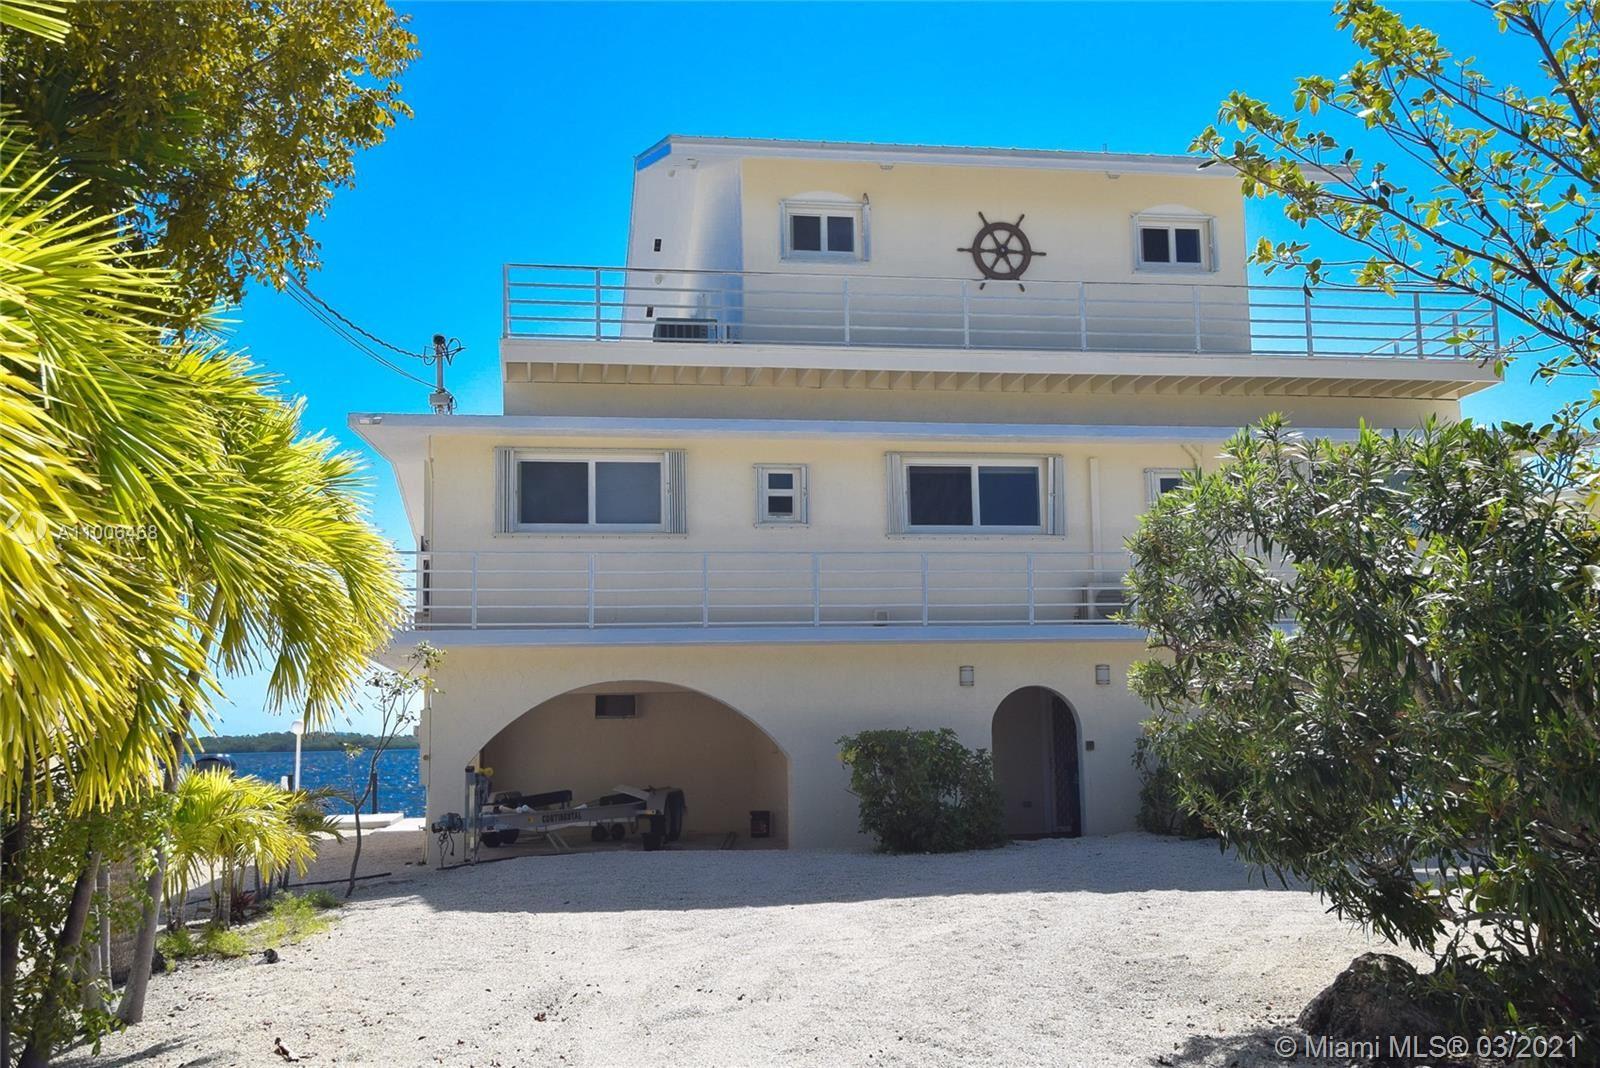 606 Island Drive, Key Largo, FL 33037 - #: A11006468